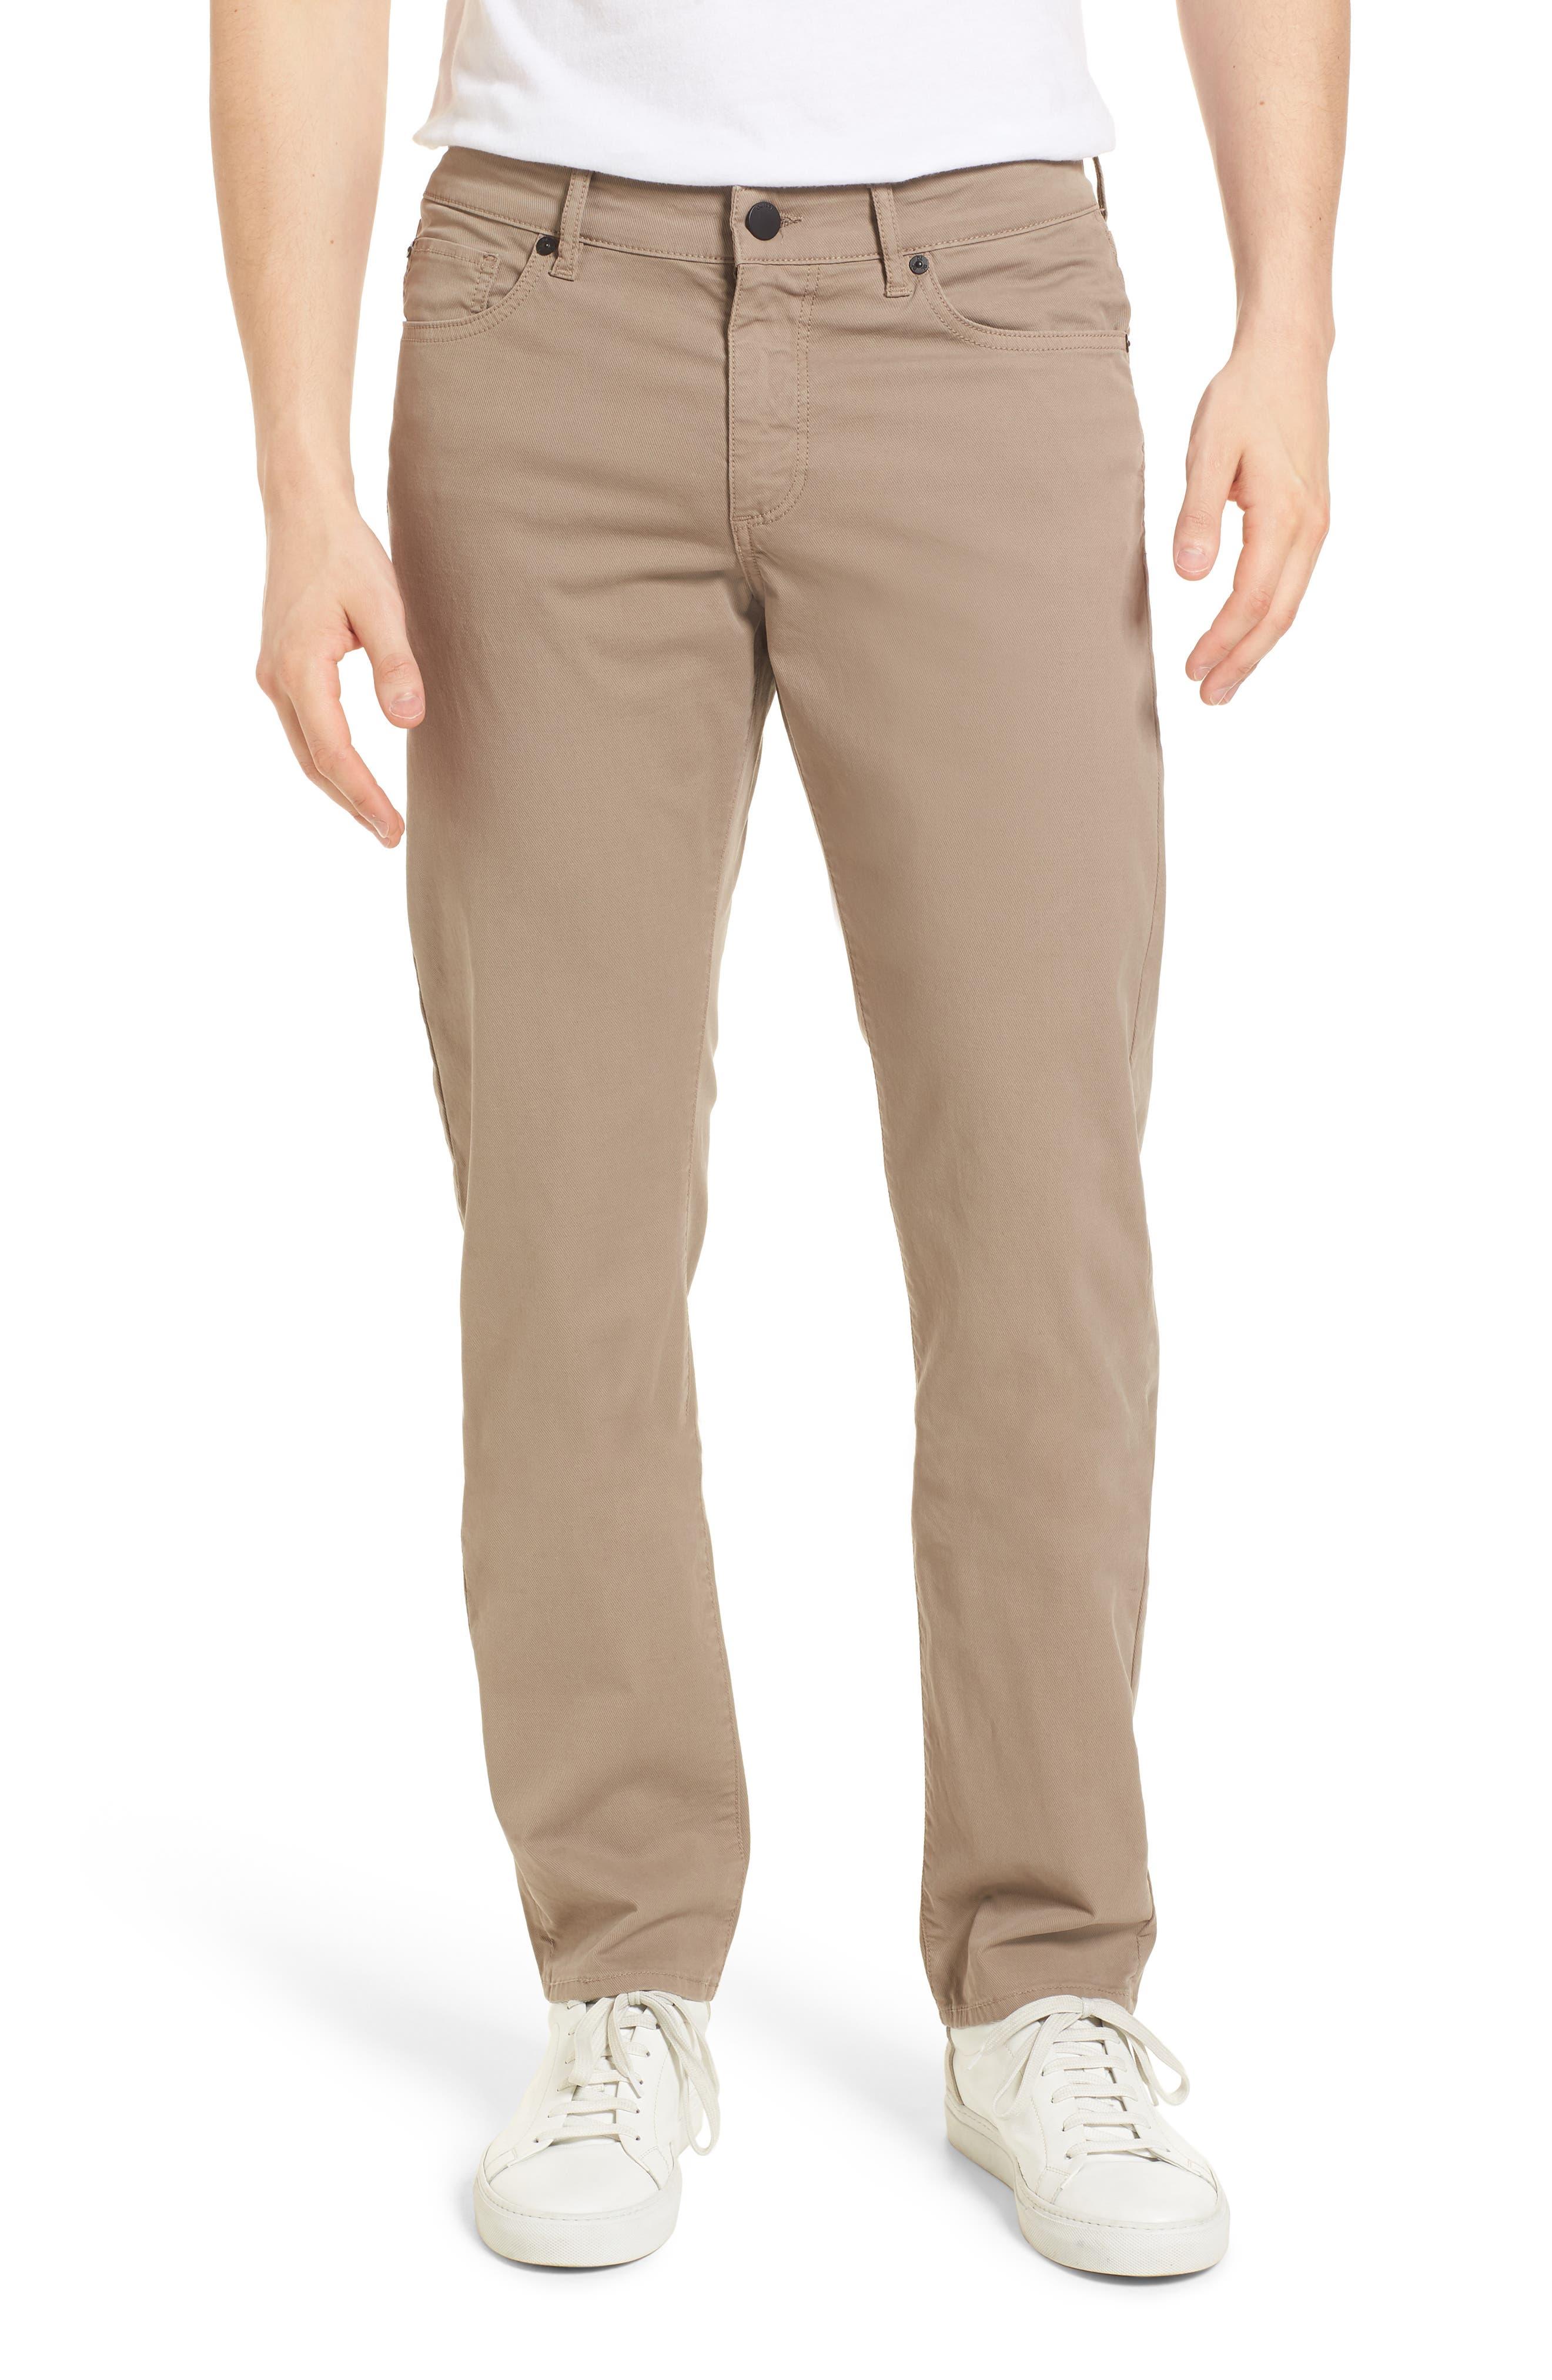 DL1961 Russel Slim Straight Chino Pants